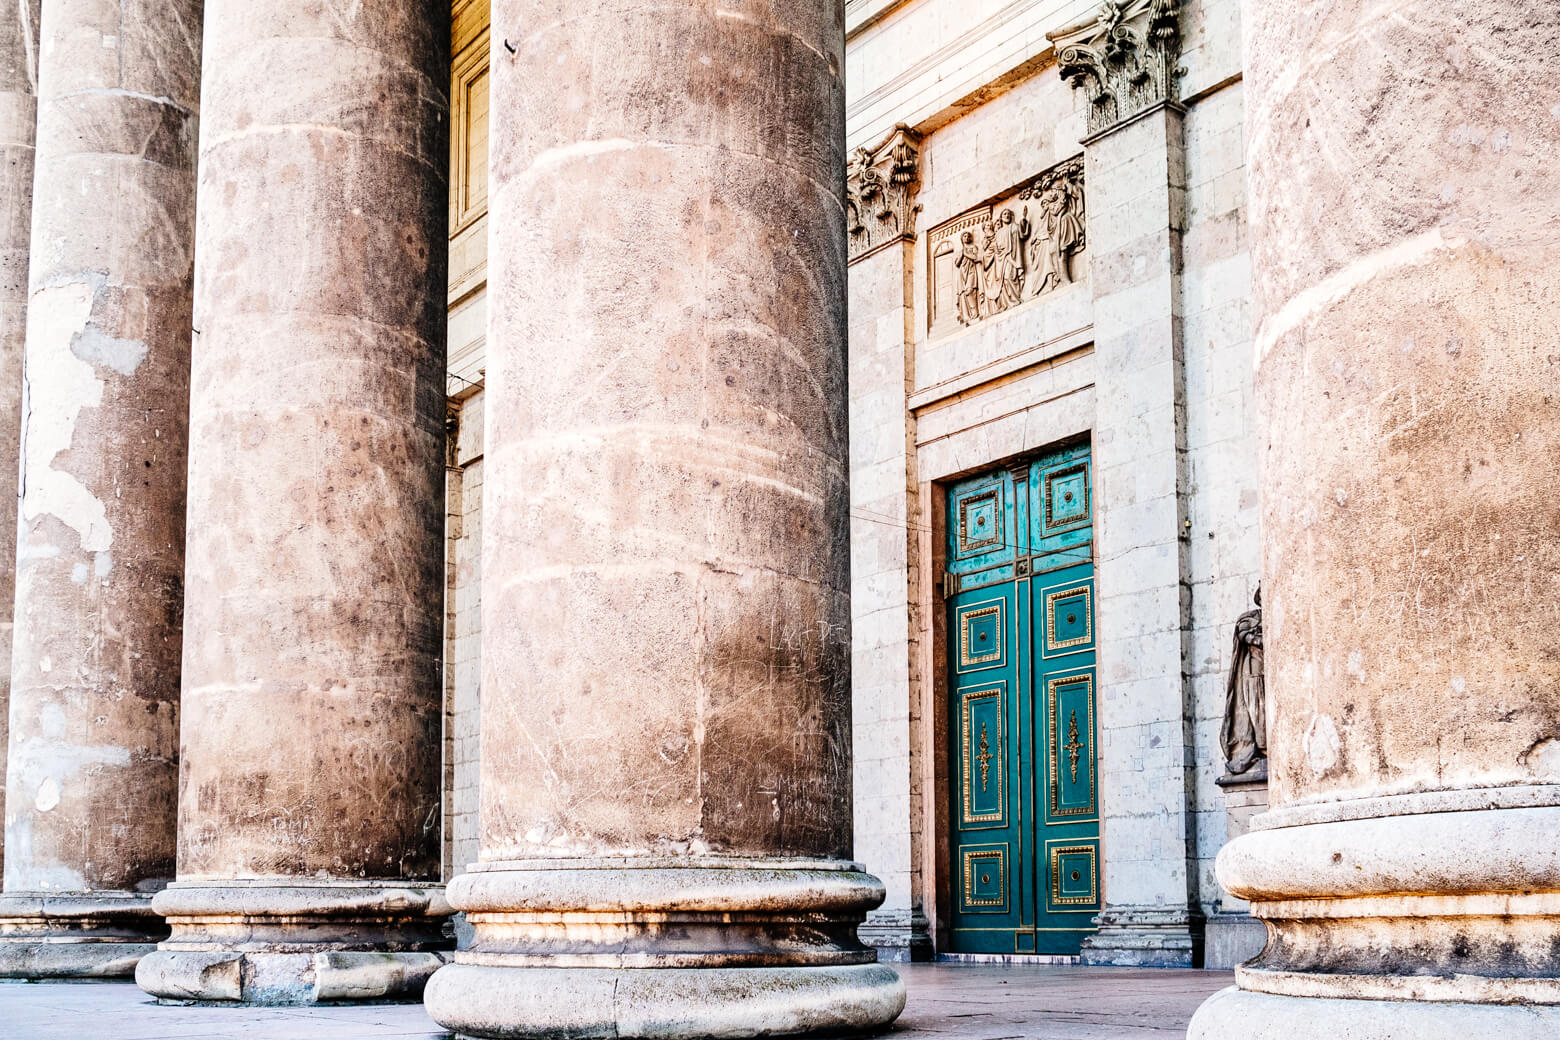 Marble Columns at Esztergom Basilica